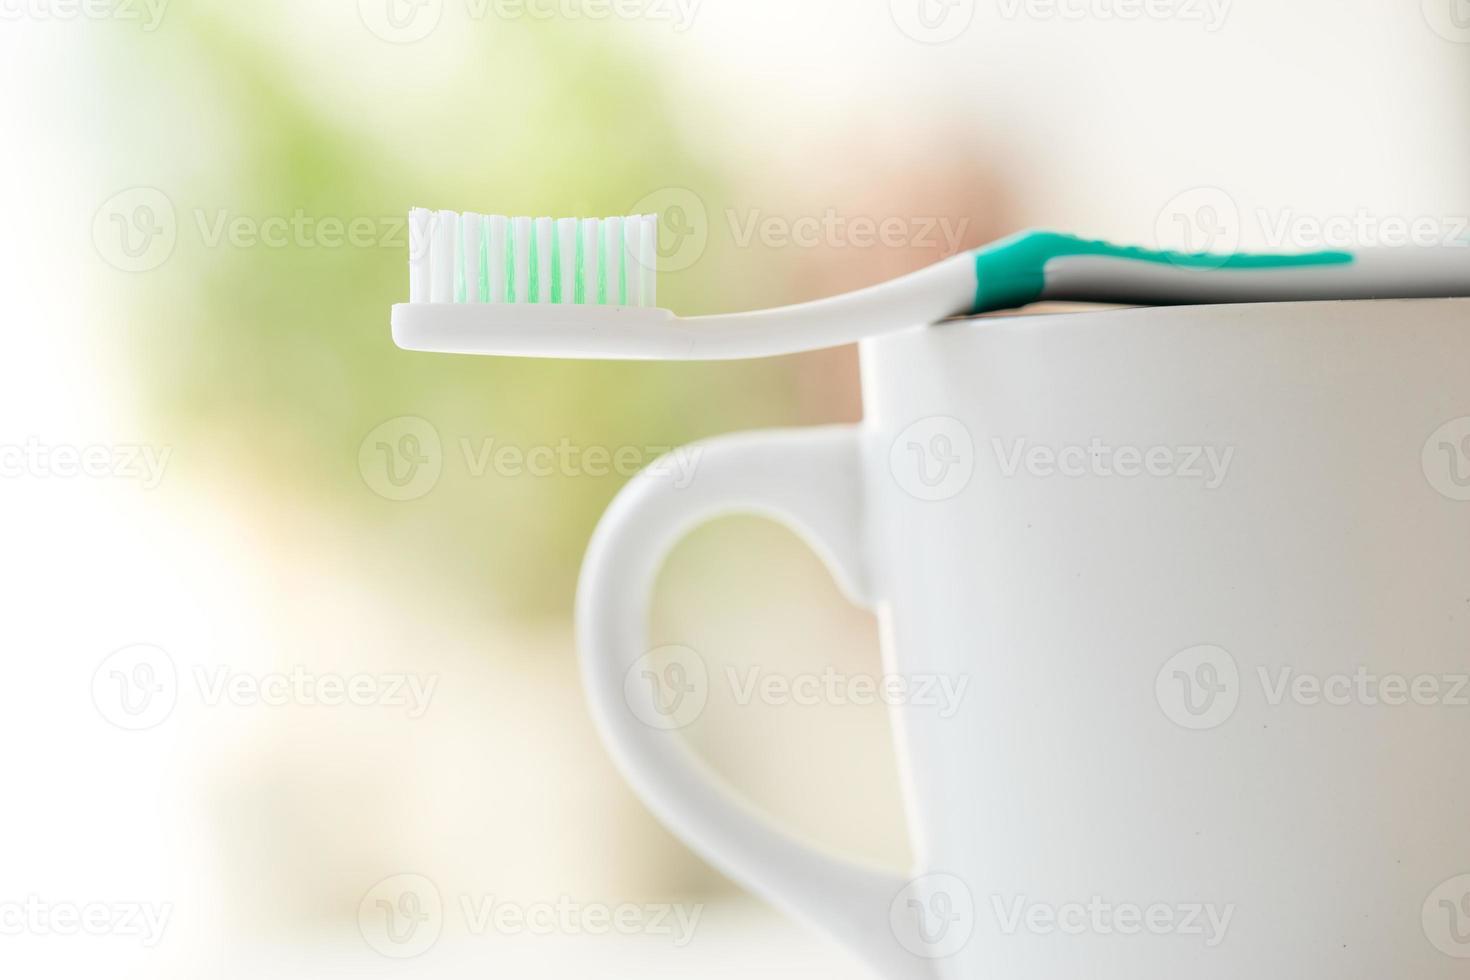 set di spazzolini da denti per cure odontoiatriche foto